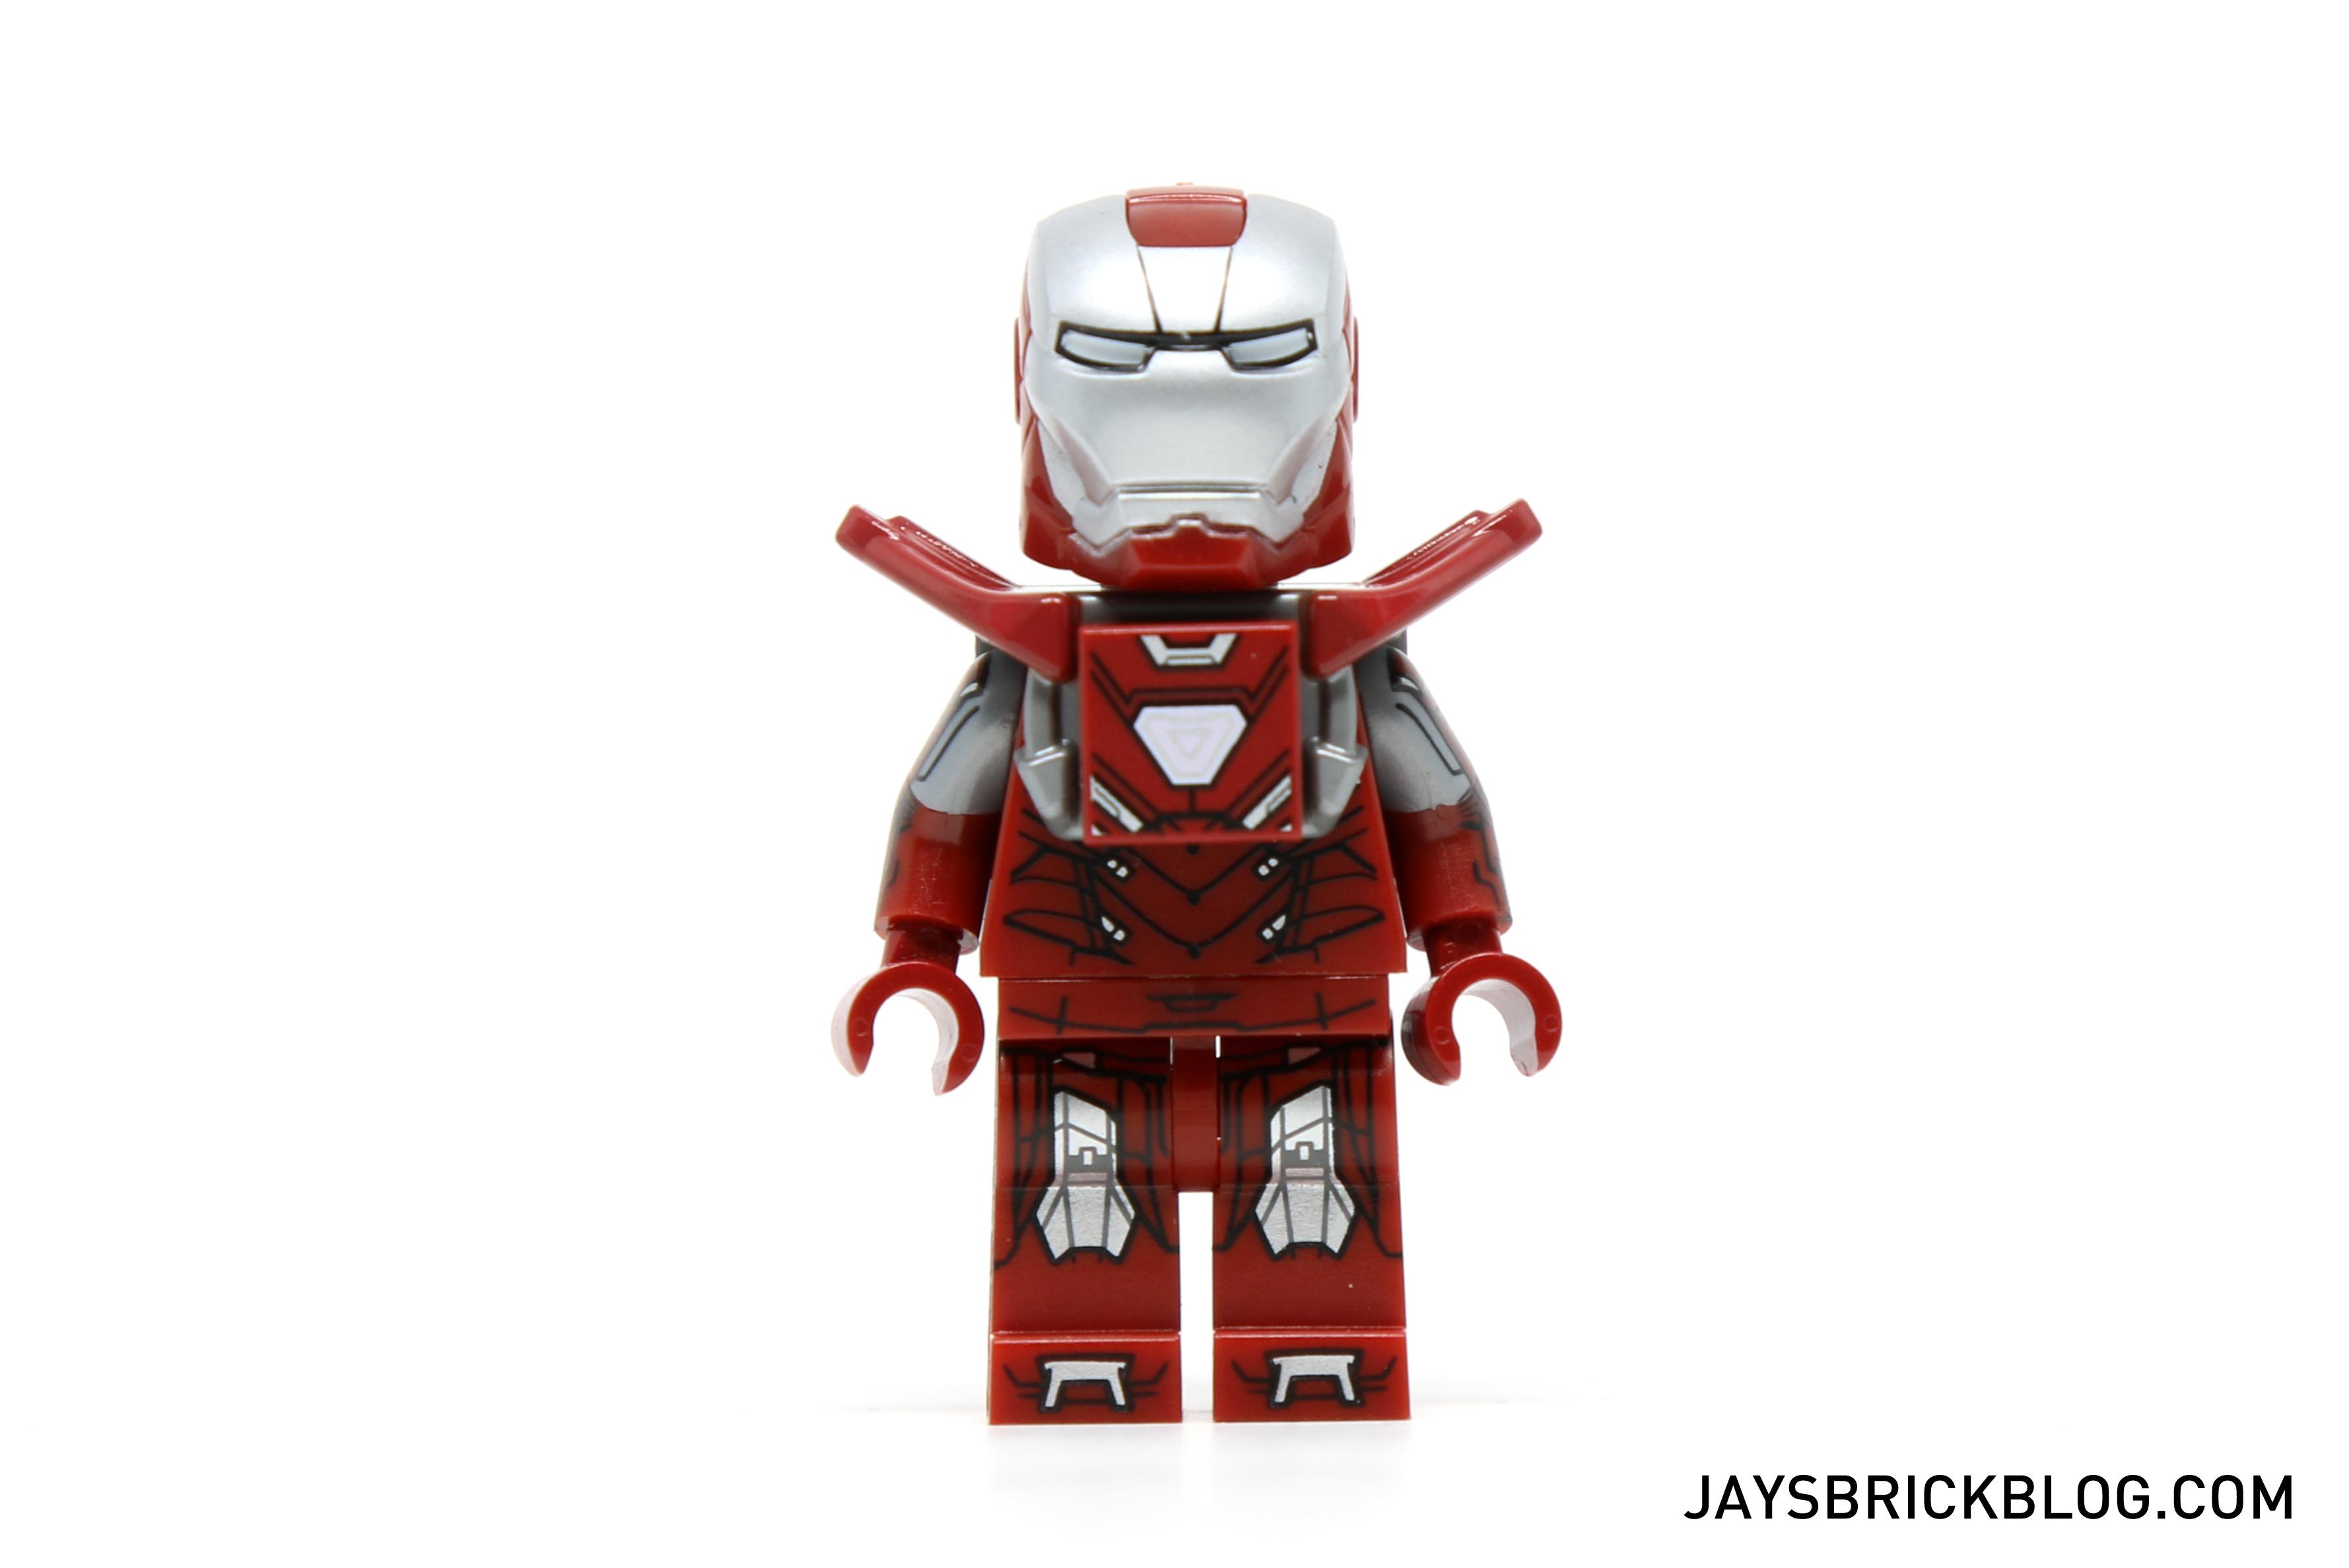 Centurion Brick Silver 5002946 – Blog Polybag ReviewLego Jay's uZkOPXi